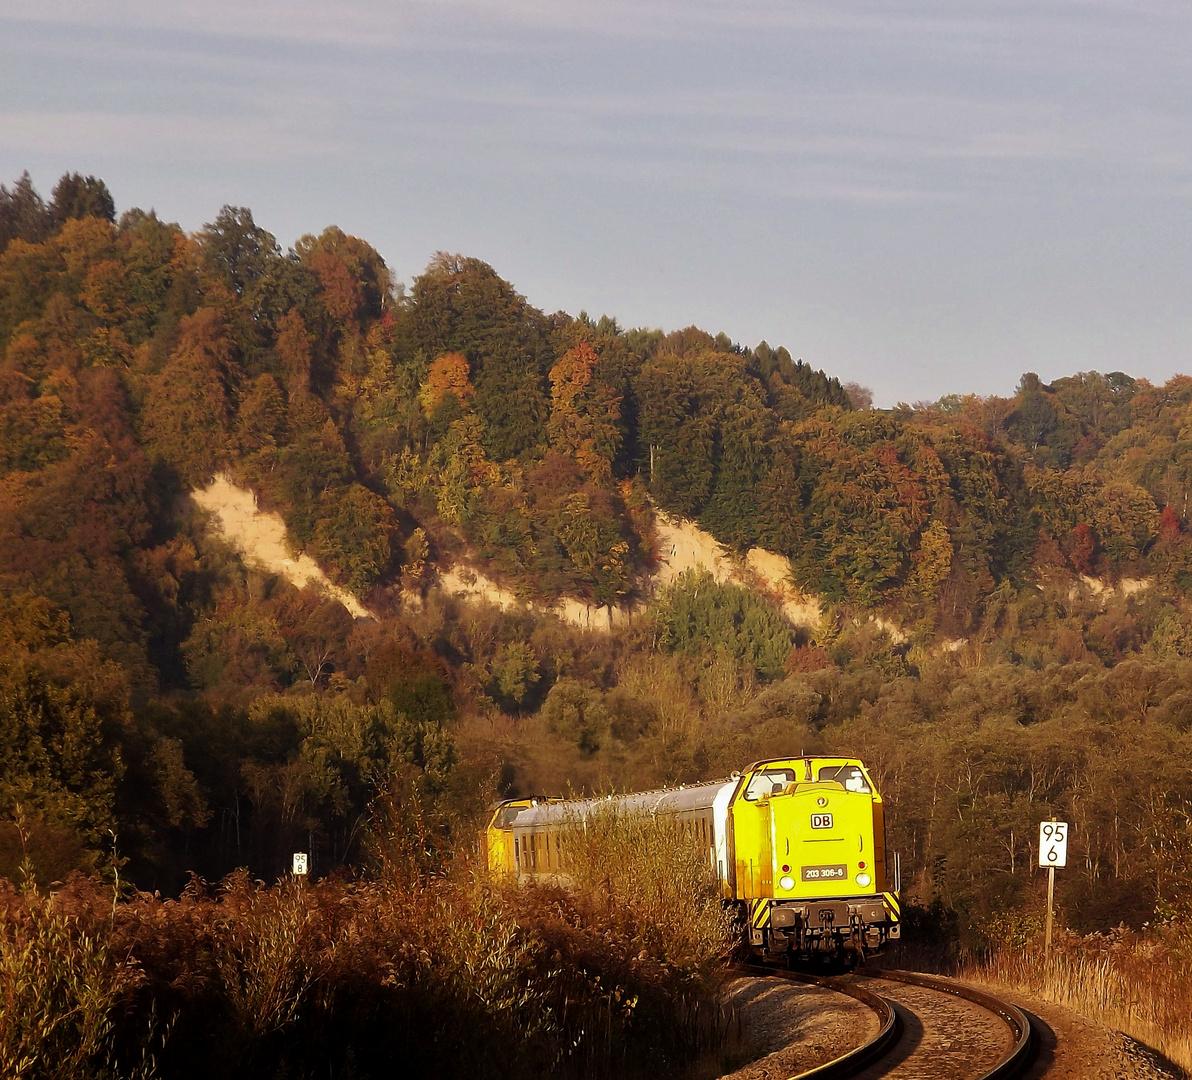 OstPower in Ober/Niederbayern